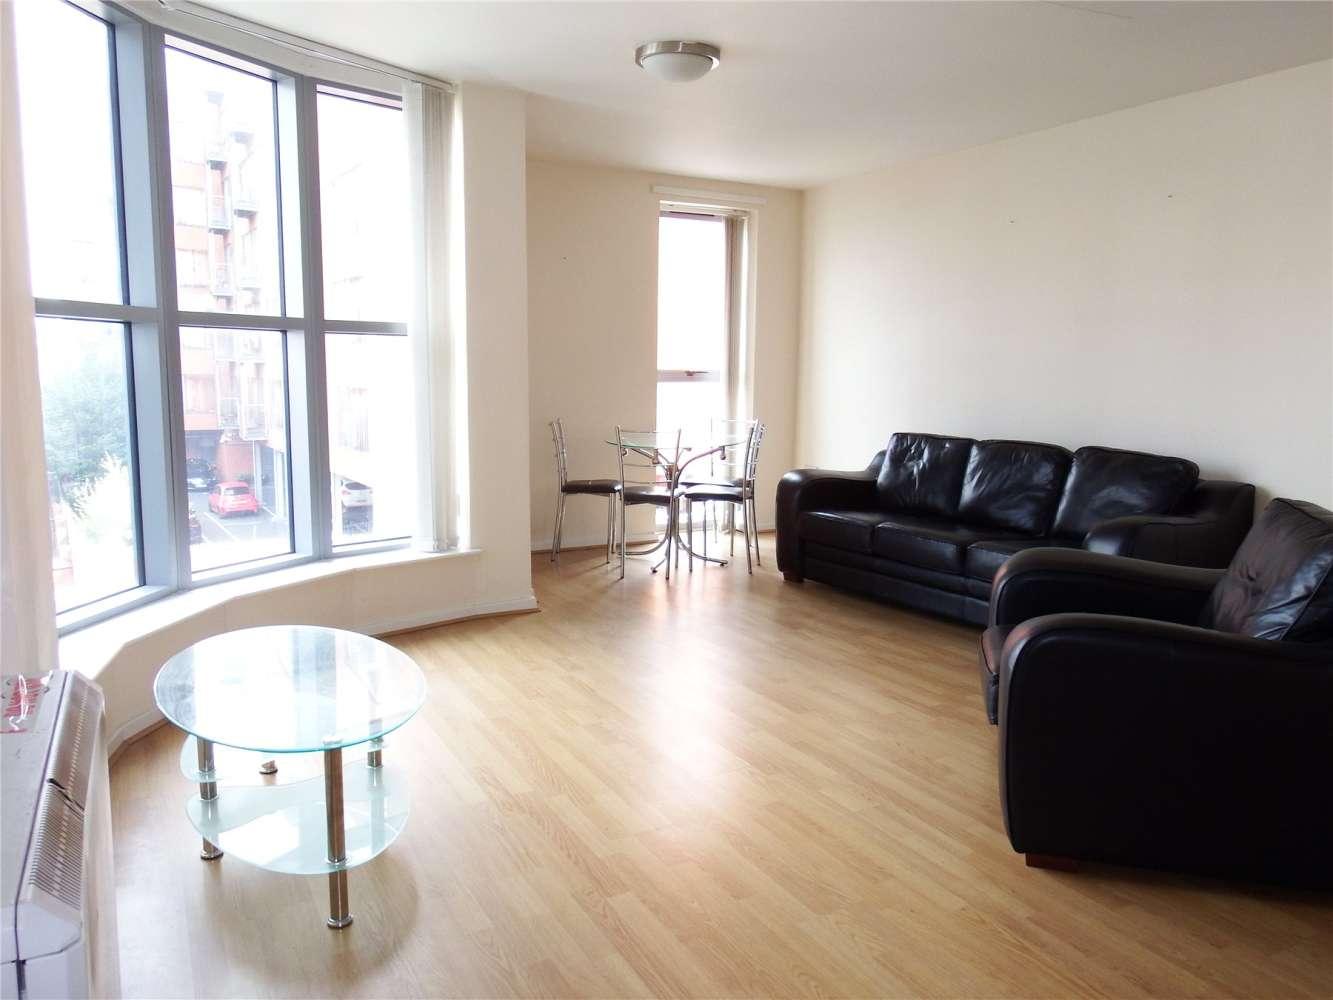 Apartment Leeds, LS2 - Ahlux Court Millwright Street Leeds West Yorkshire - 03